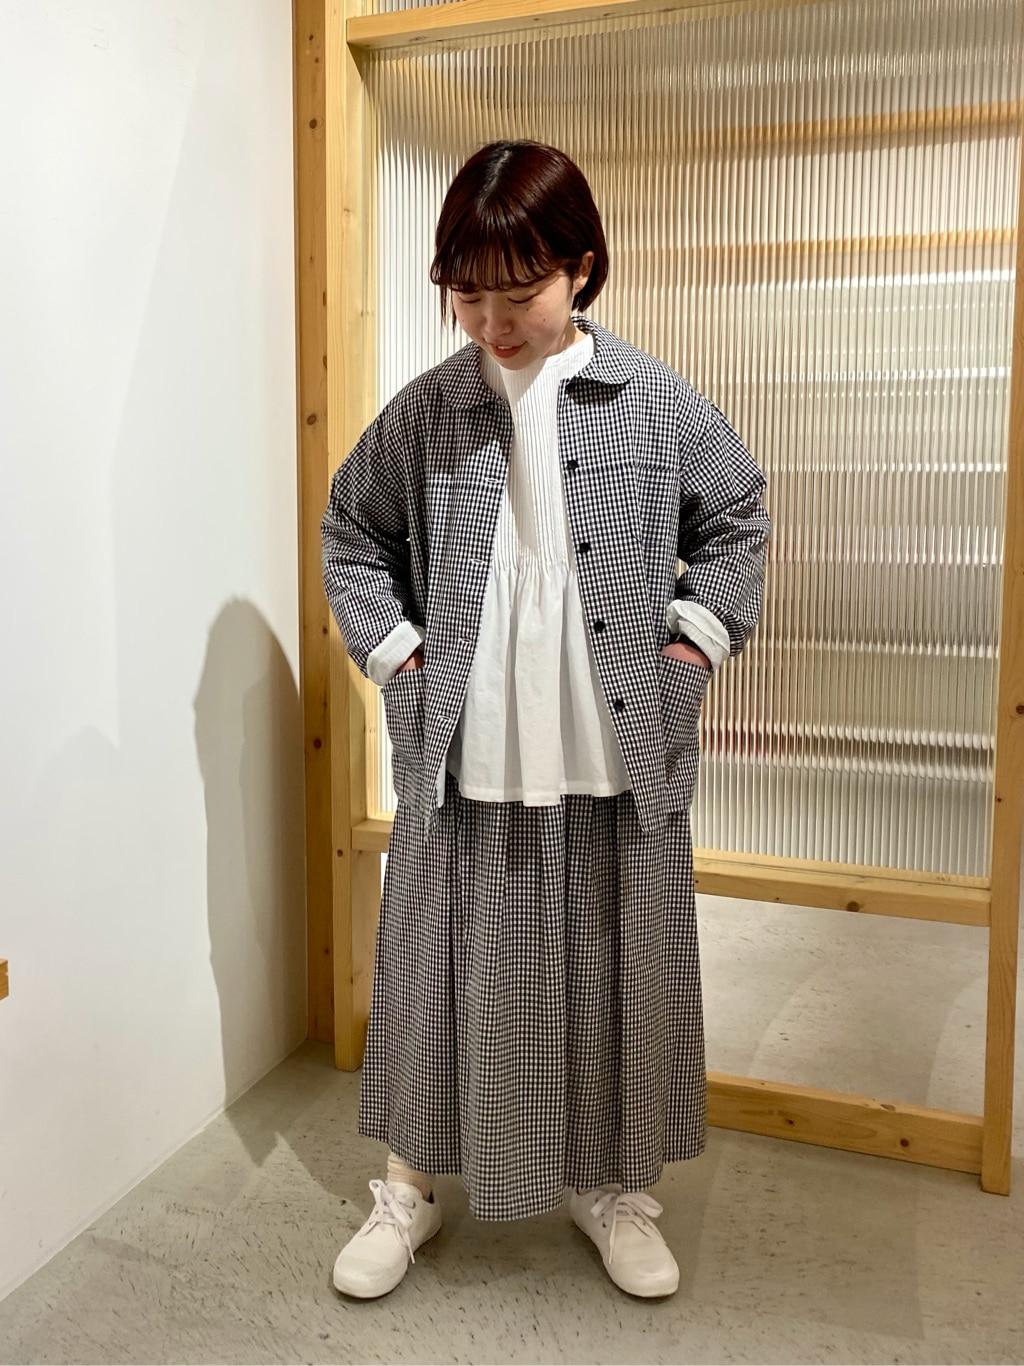 chambre de charme 京都路面 身長:150cm 2021.02.19